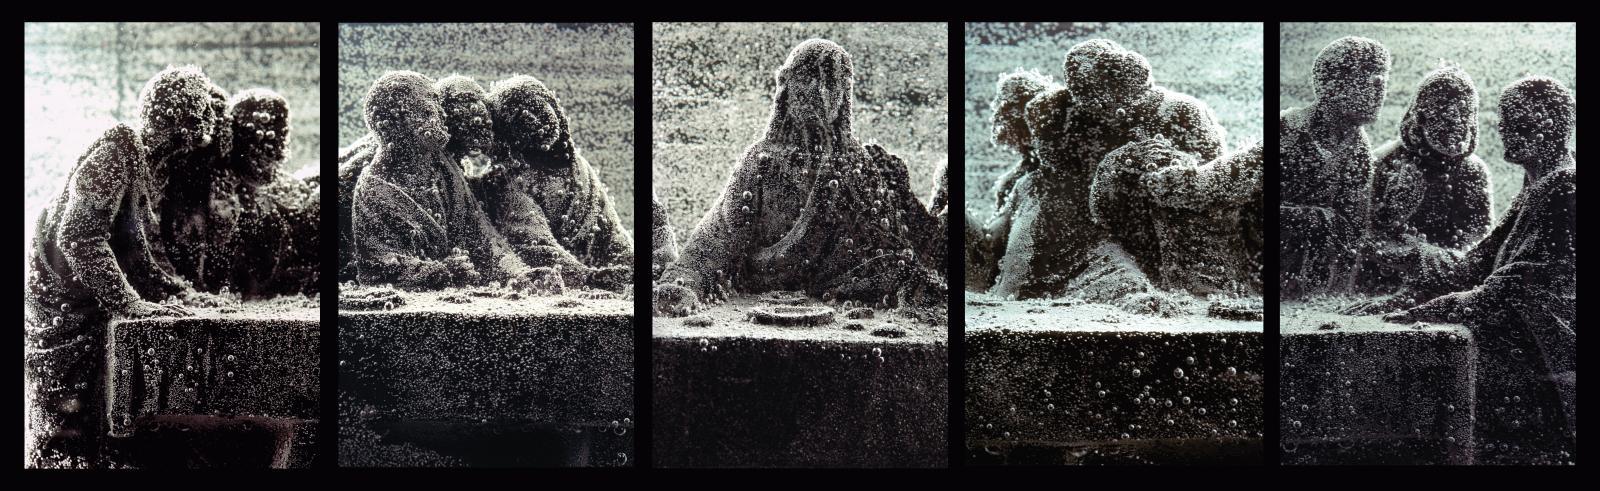 Andres Serrano, The Last Supper.